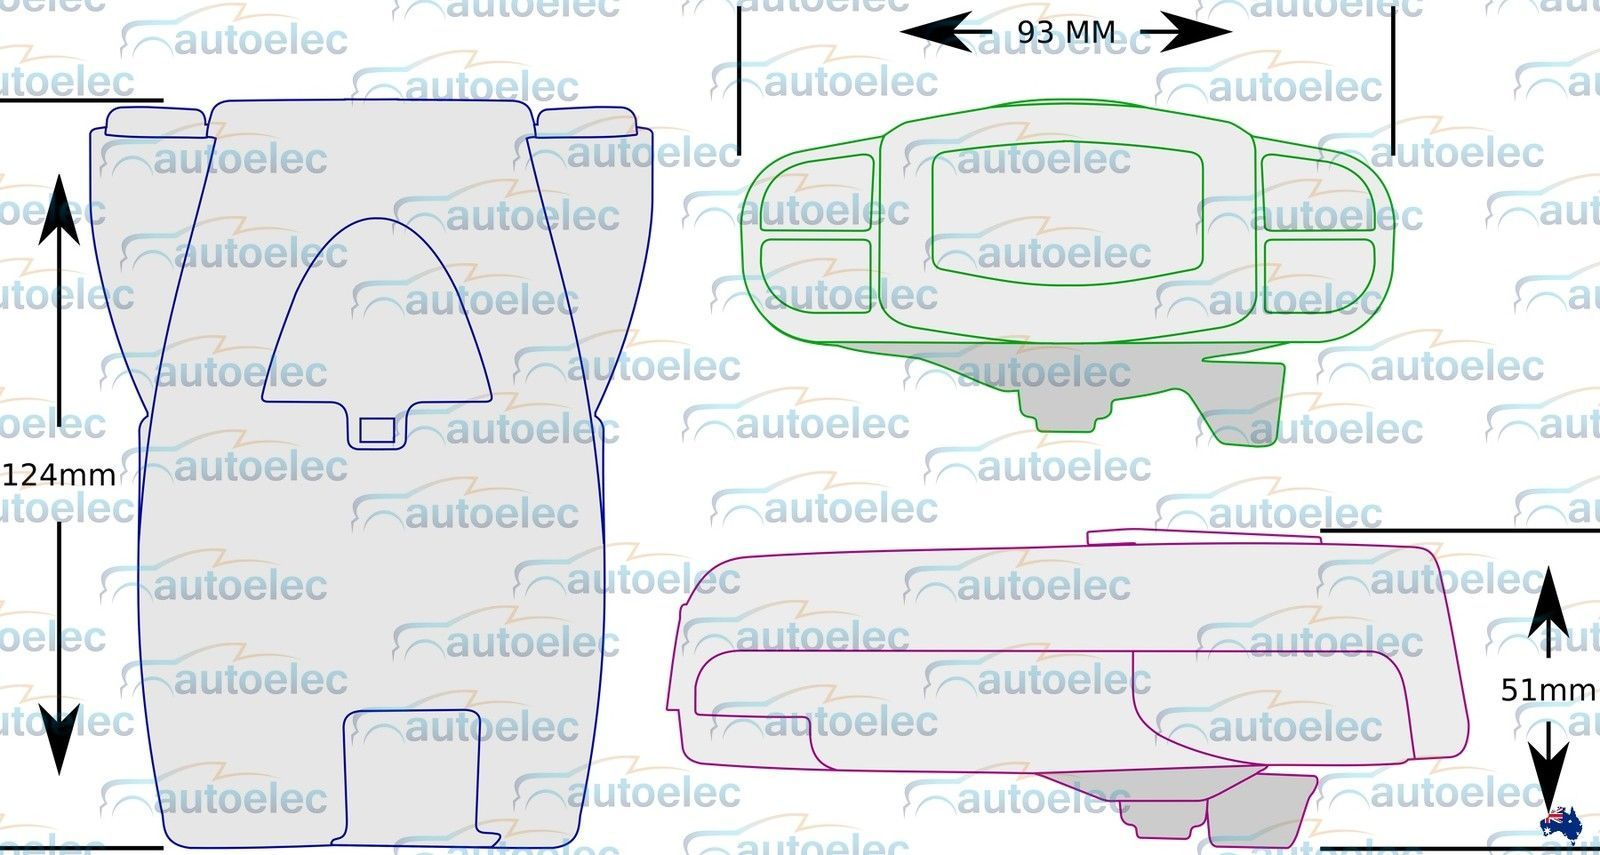 Tekonsha P3 Prodigy Caravan Trailer Electric Brake Controller + Bonus - Trailer Wiring Diagram With Electric Brakes